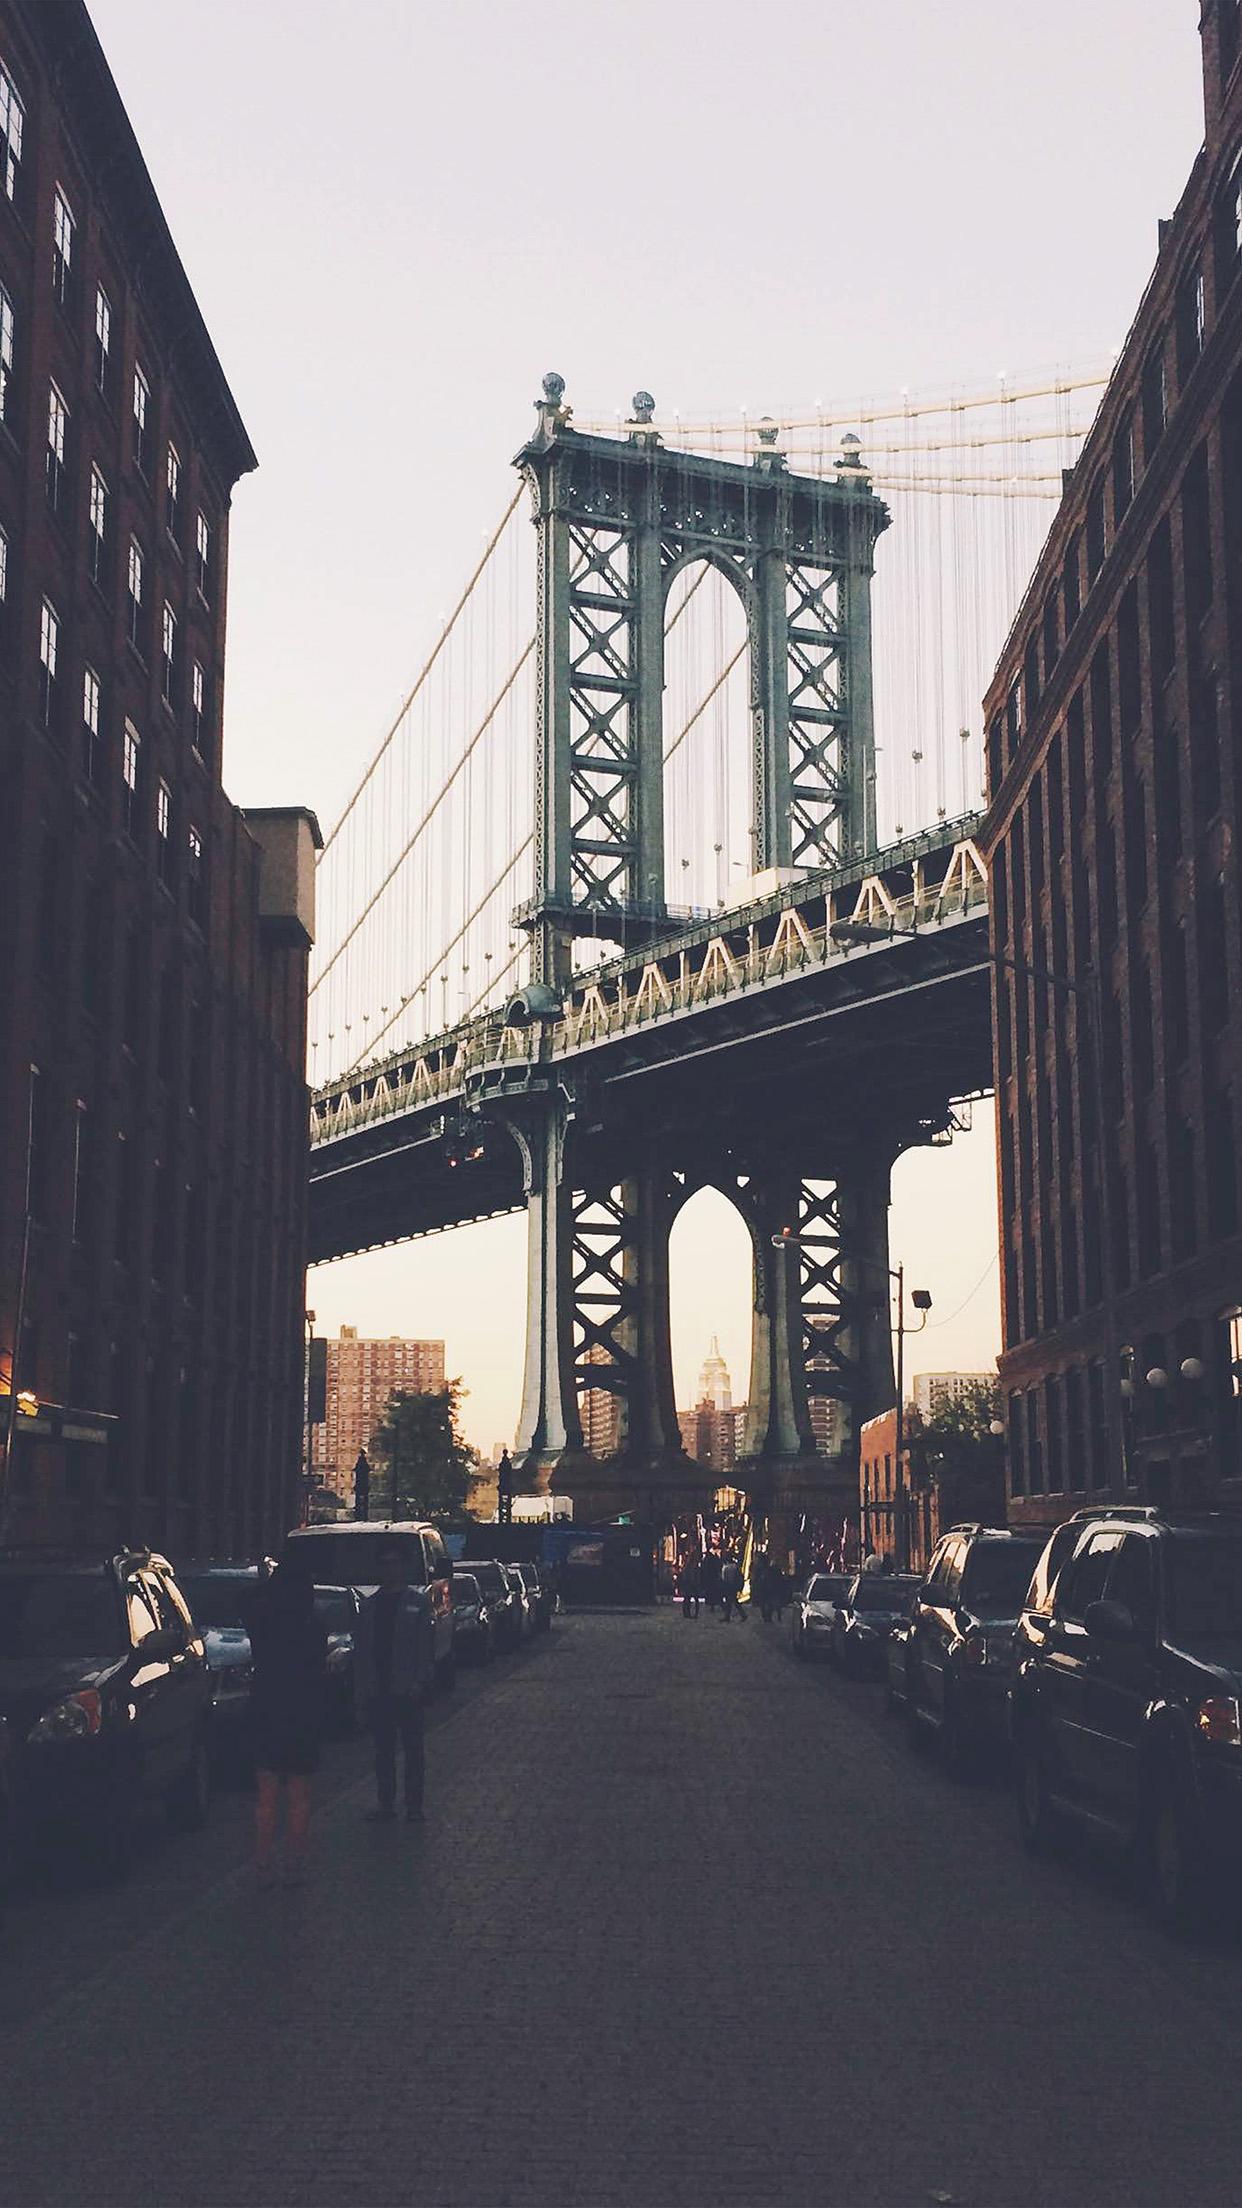 New York New York Bridge city 3Wallpapers iPhone Parallax New York Bridge